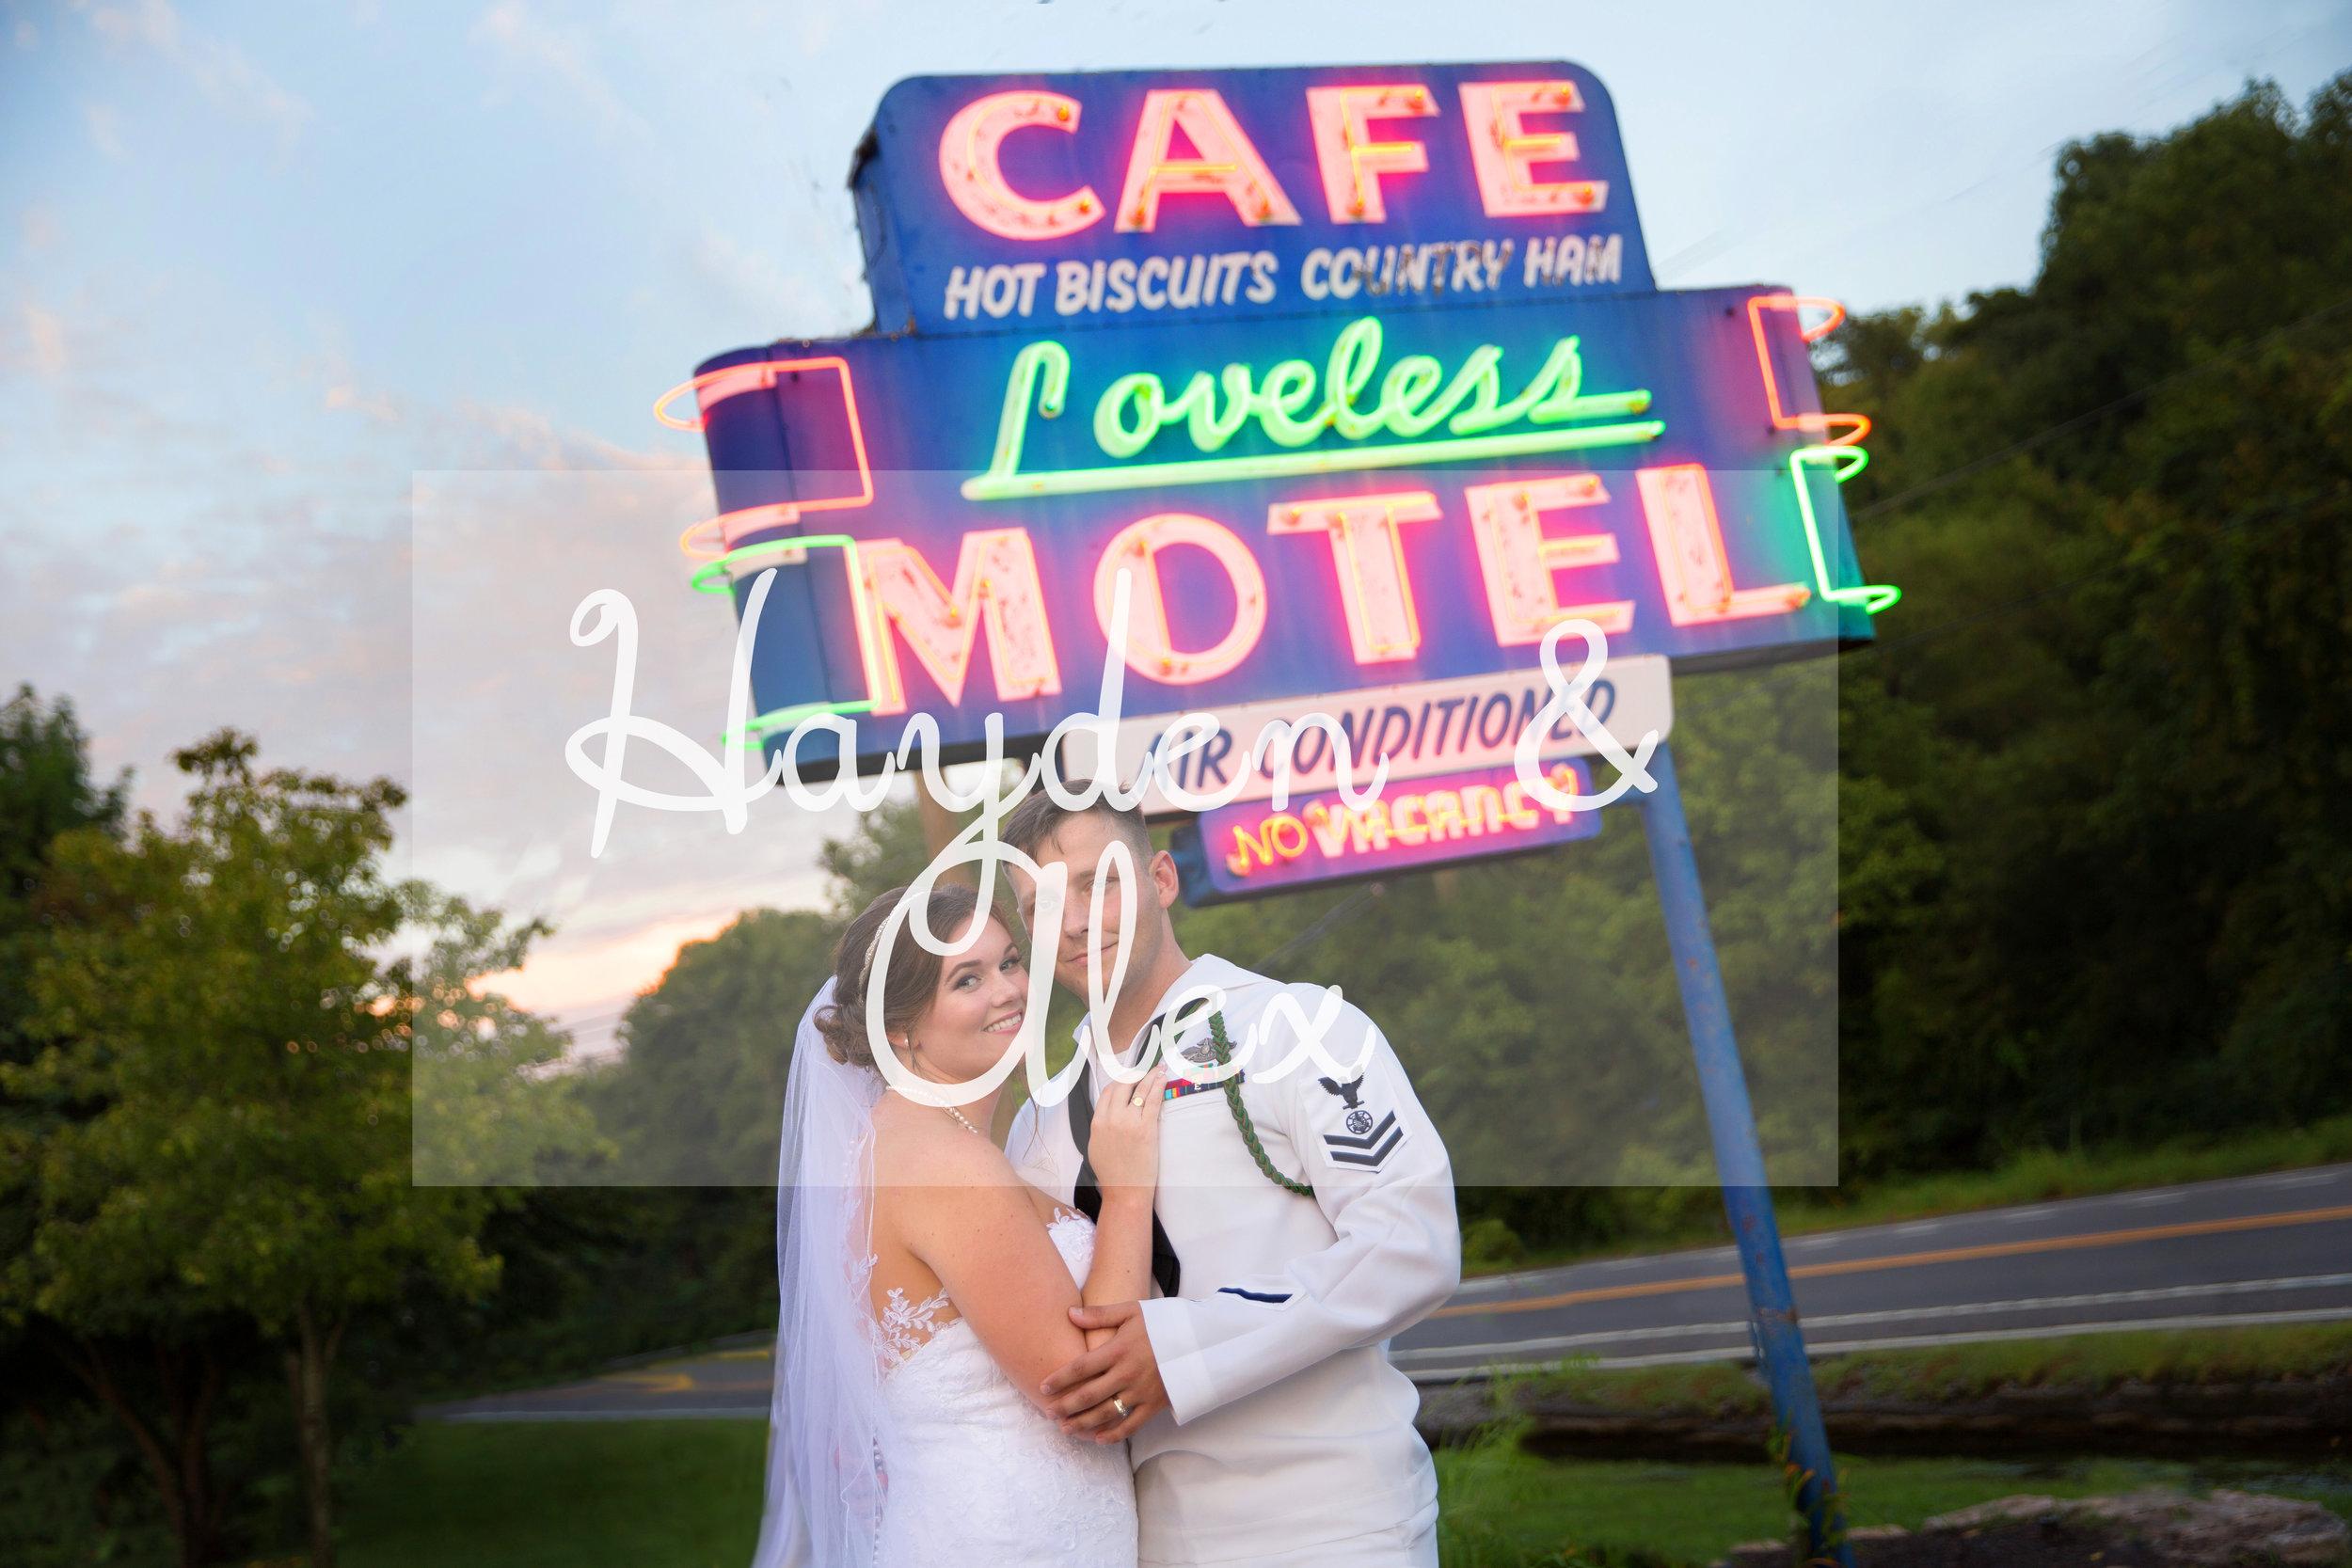 Farmer Wedding - chelsea meadows photography (2)_edited-1.jpg